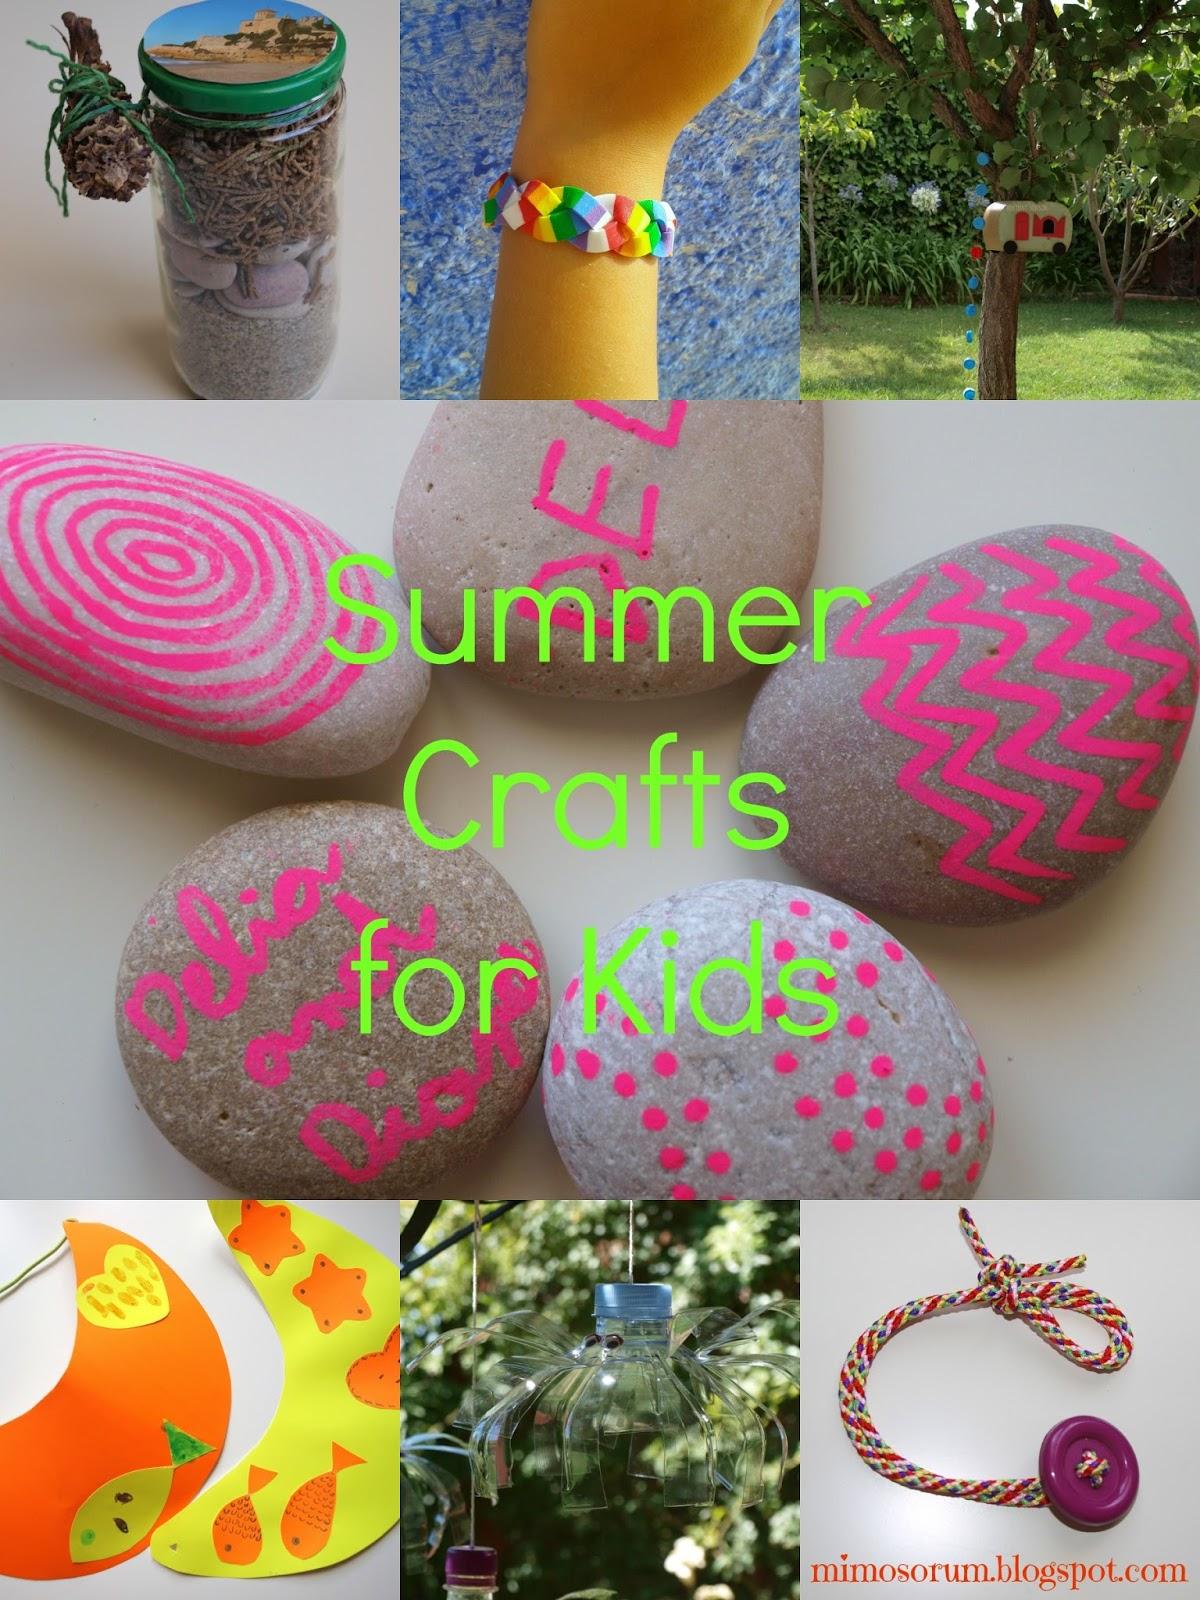 Mimosorum 7 diy para ni os en verano 7 summer crafts for kids - Www manualidades faciles ...